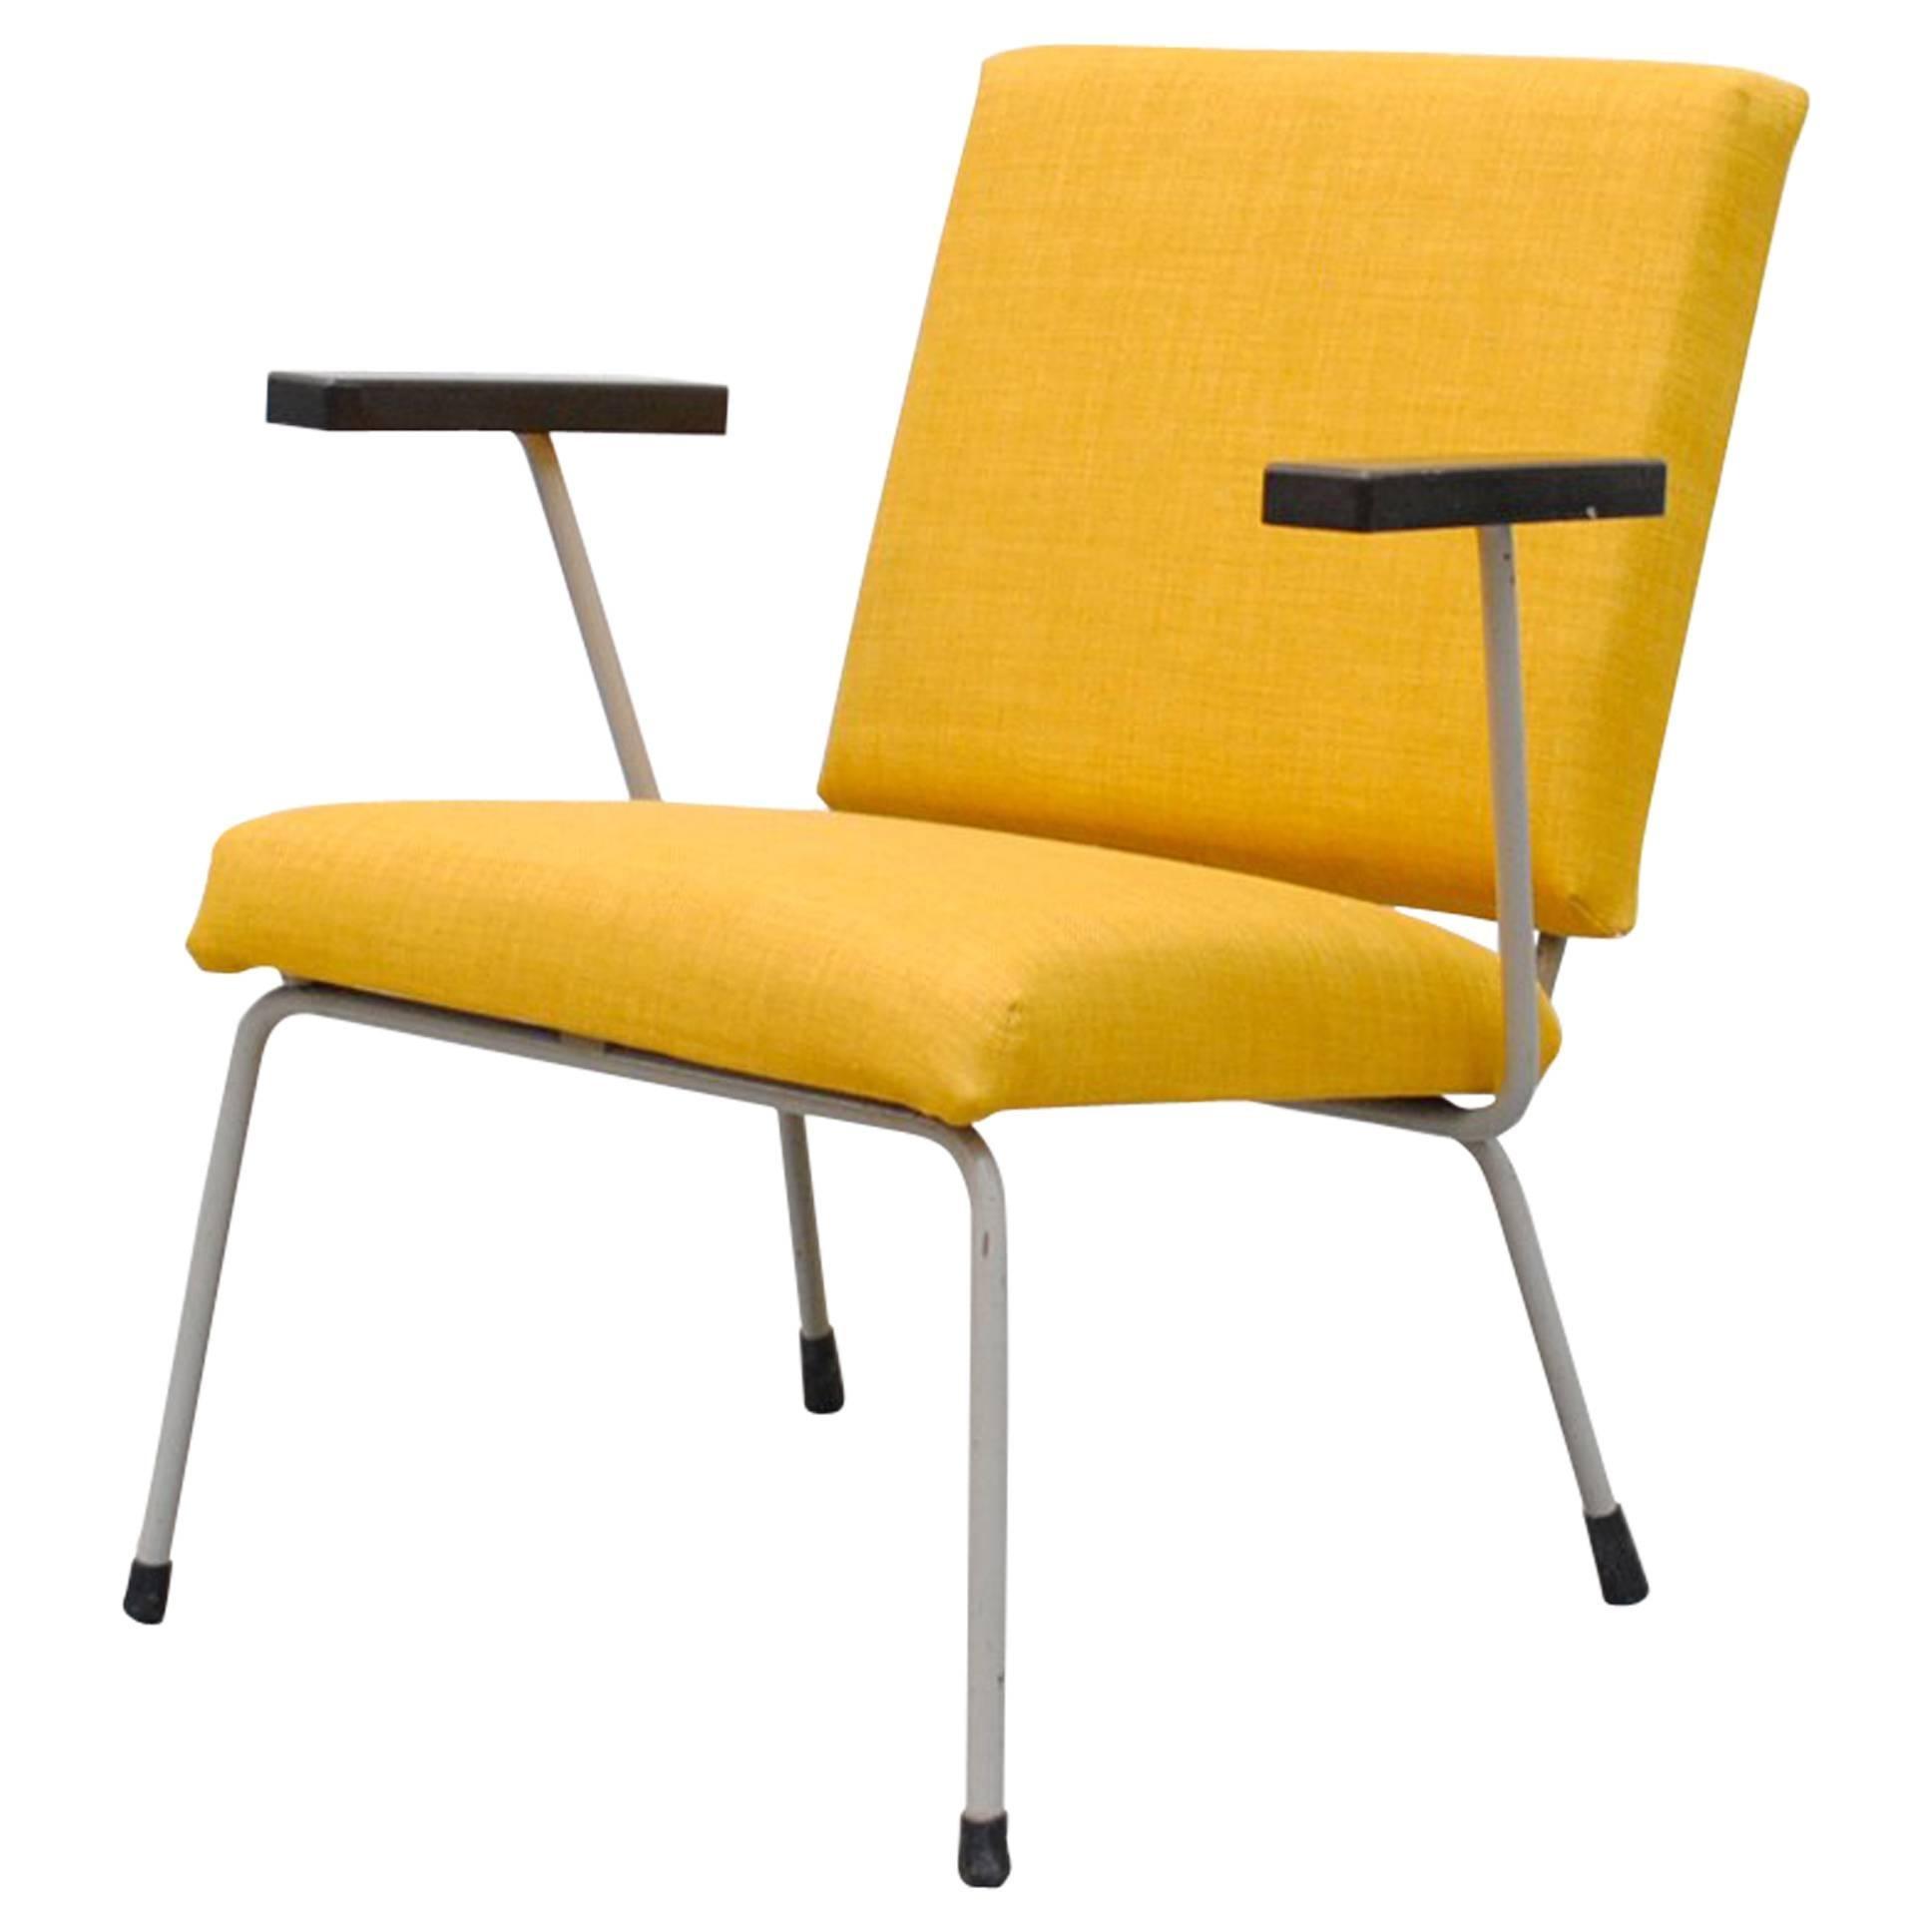 Wim Rietveld 1401 Lounge Chair for Gispen